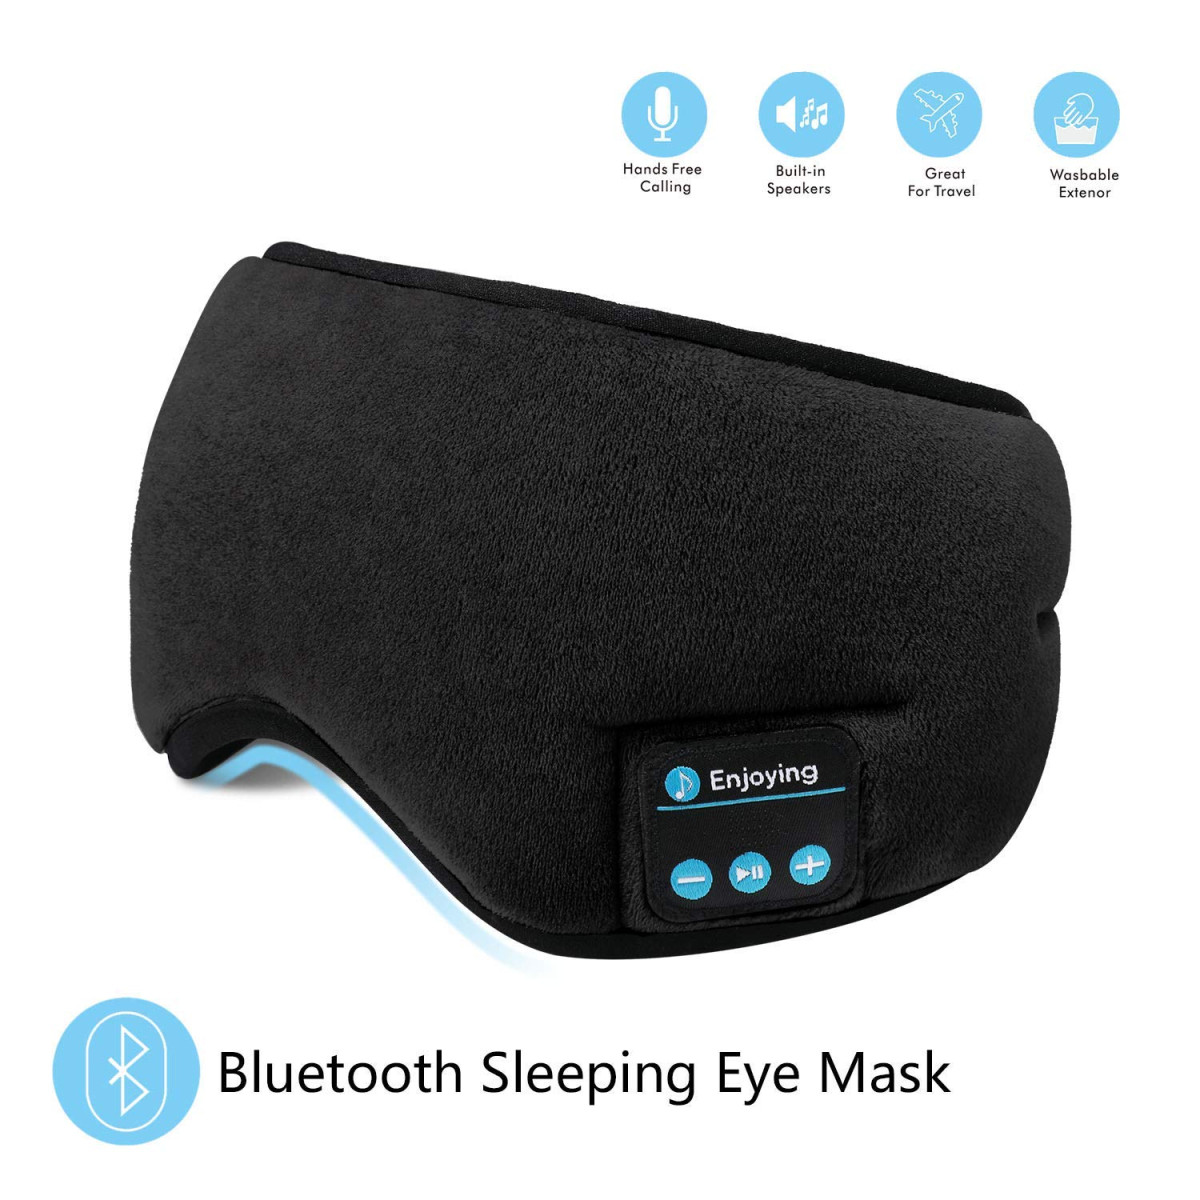 Wireless Sleep Eye Mask Shading Bluetooth Headphone Running Travel Relax